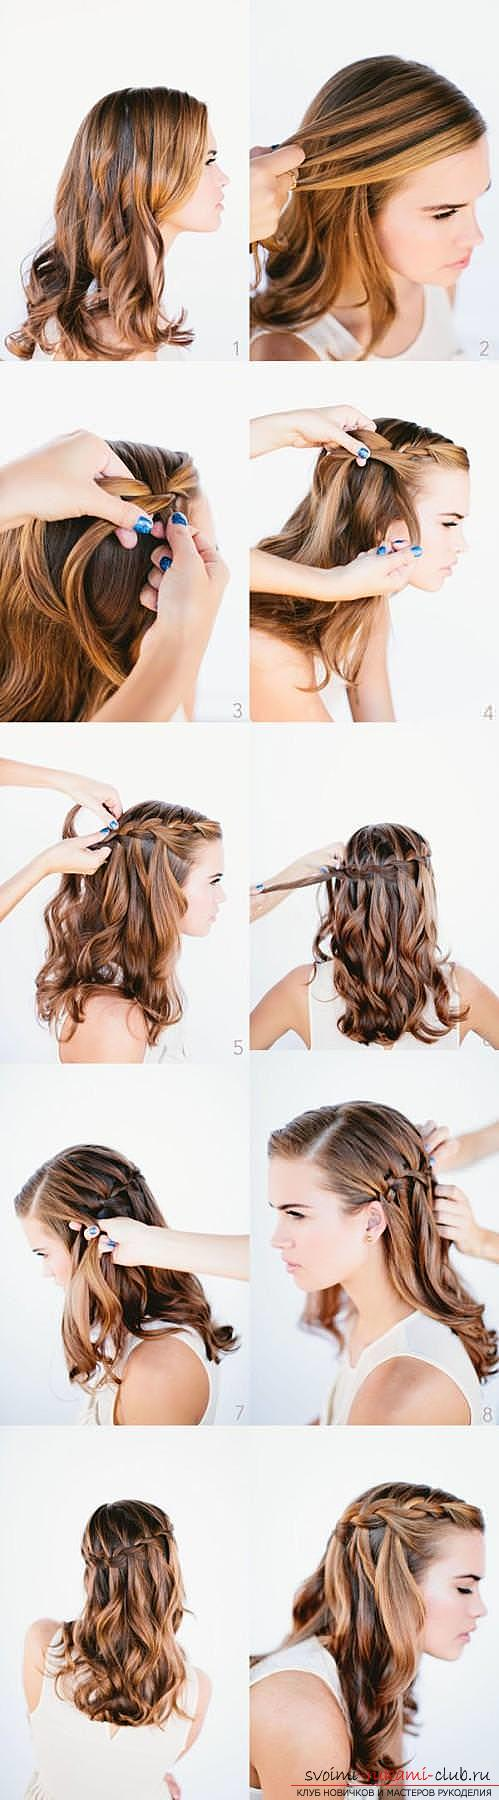 причёски из косичек на праздник фото и схема